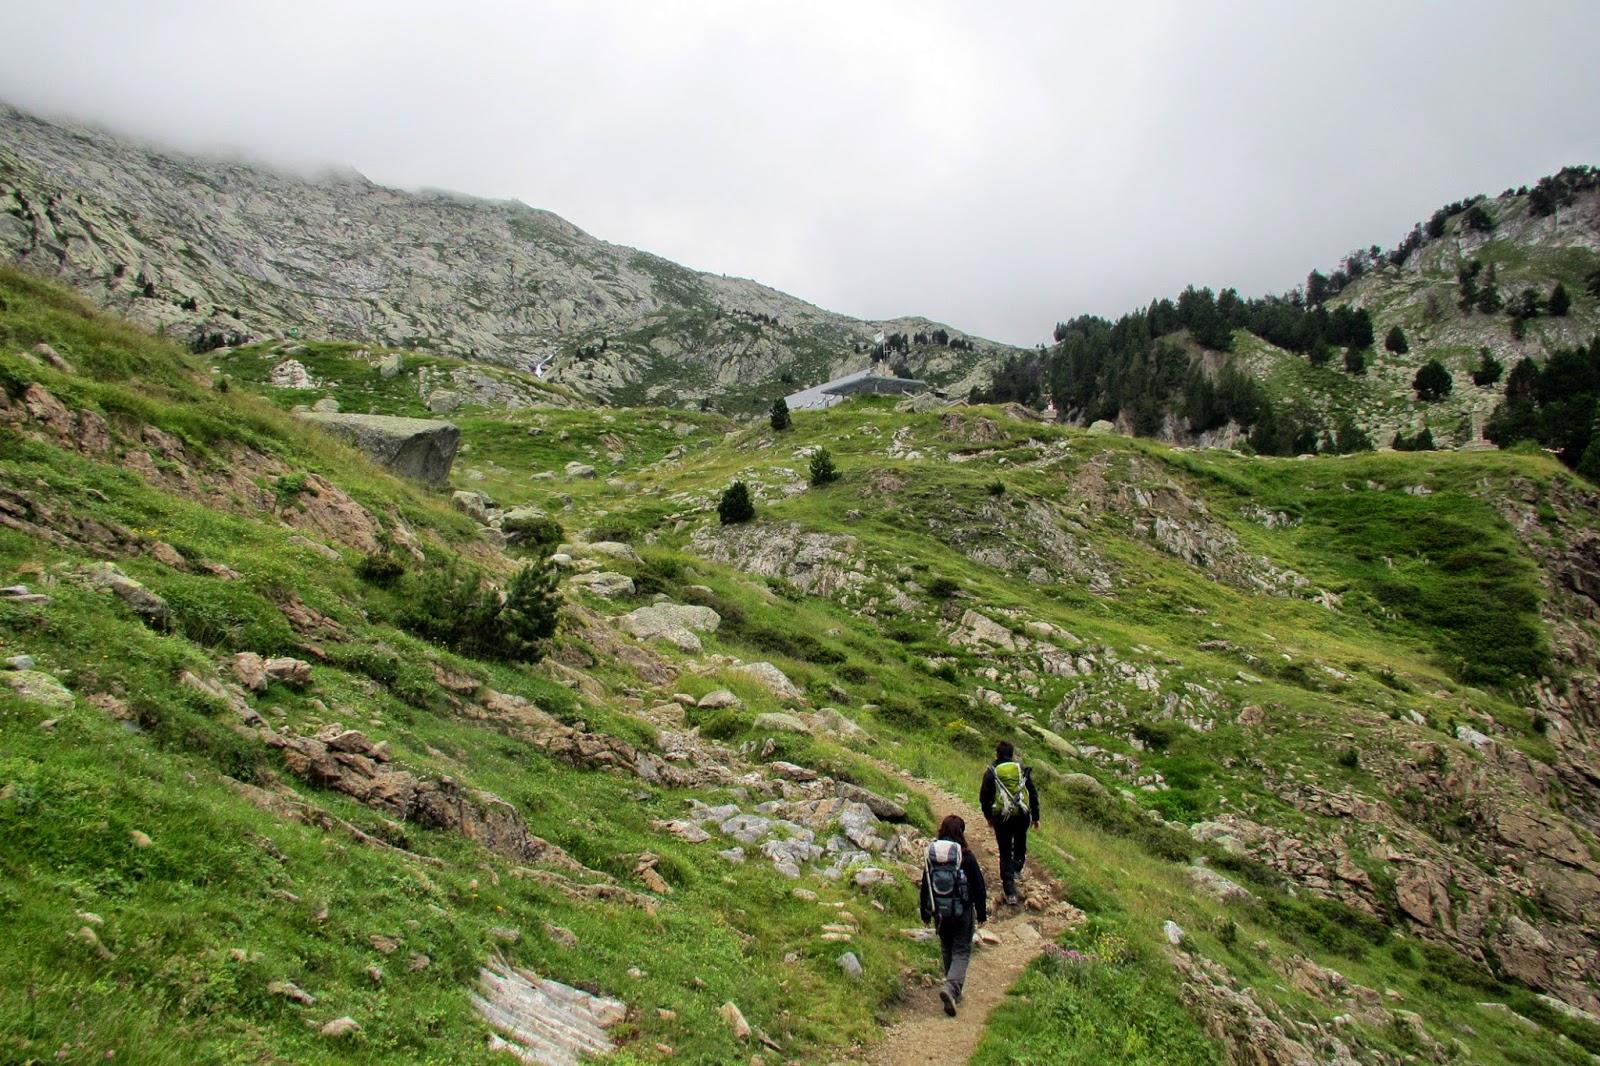 Subida al Refugio La Renclusa desde la Basurta.